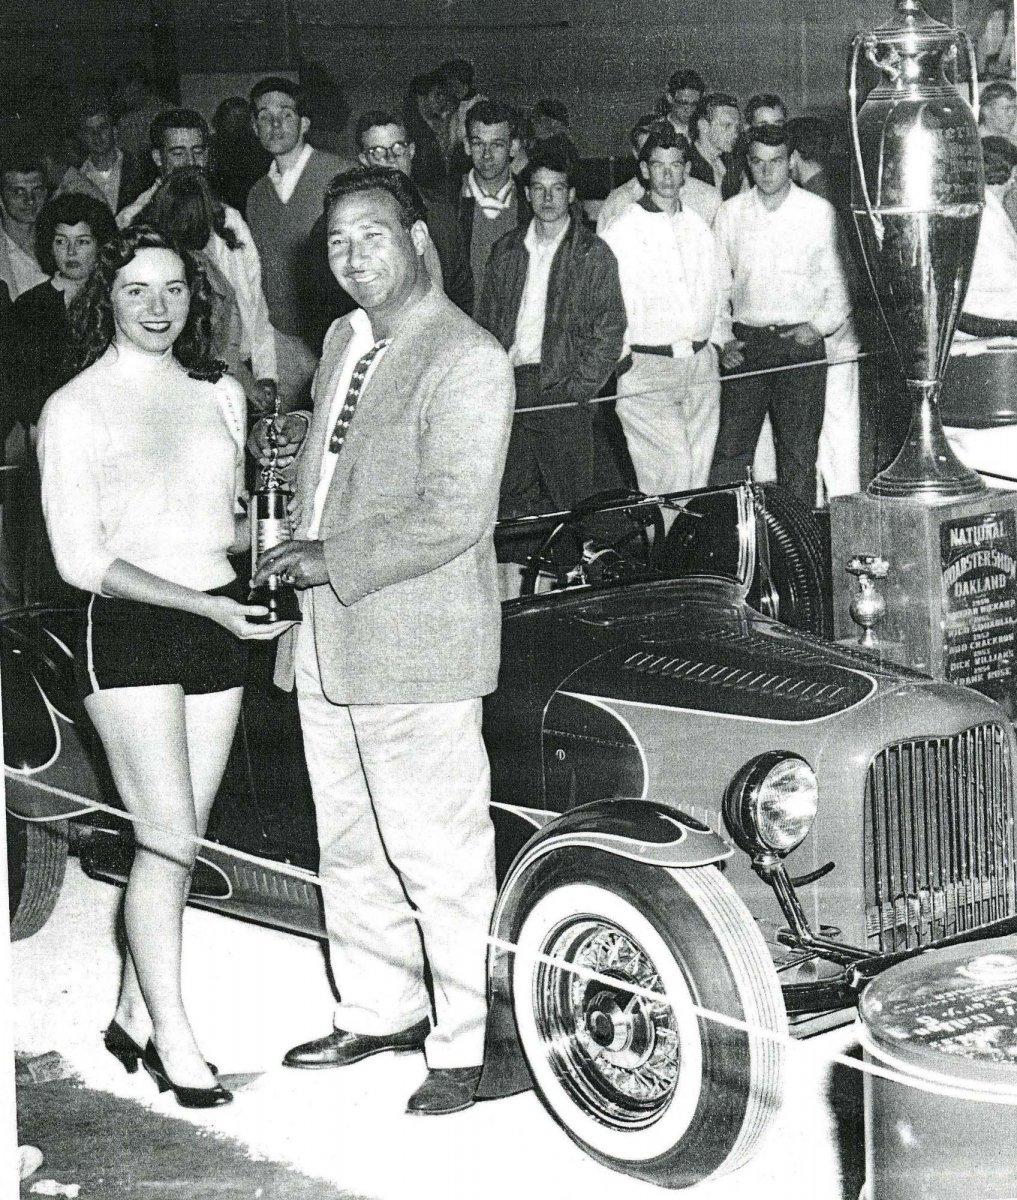 21-history-grand-national-roadster-show-lpr.jpg